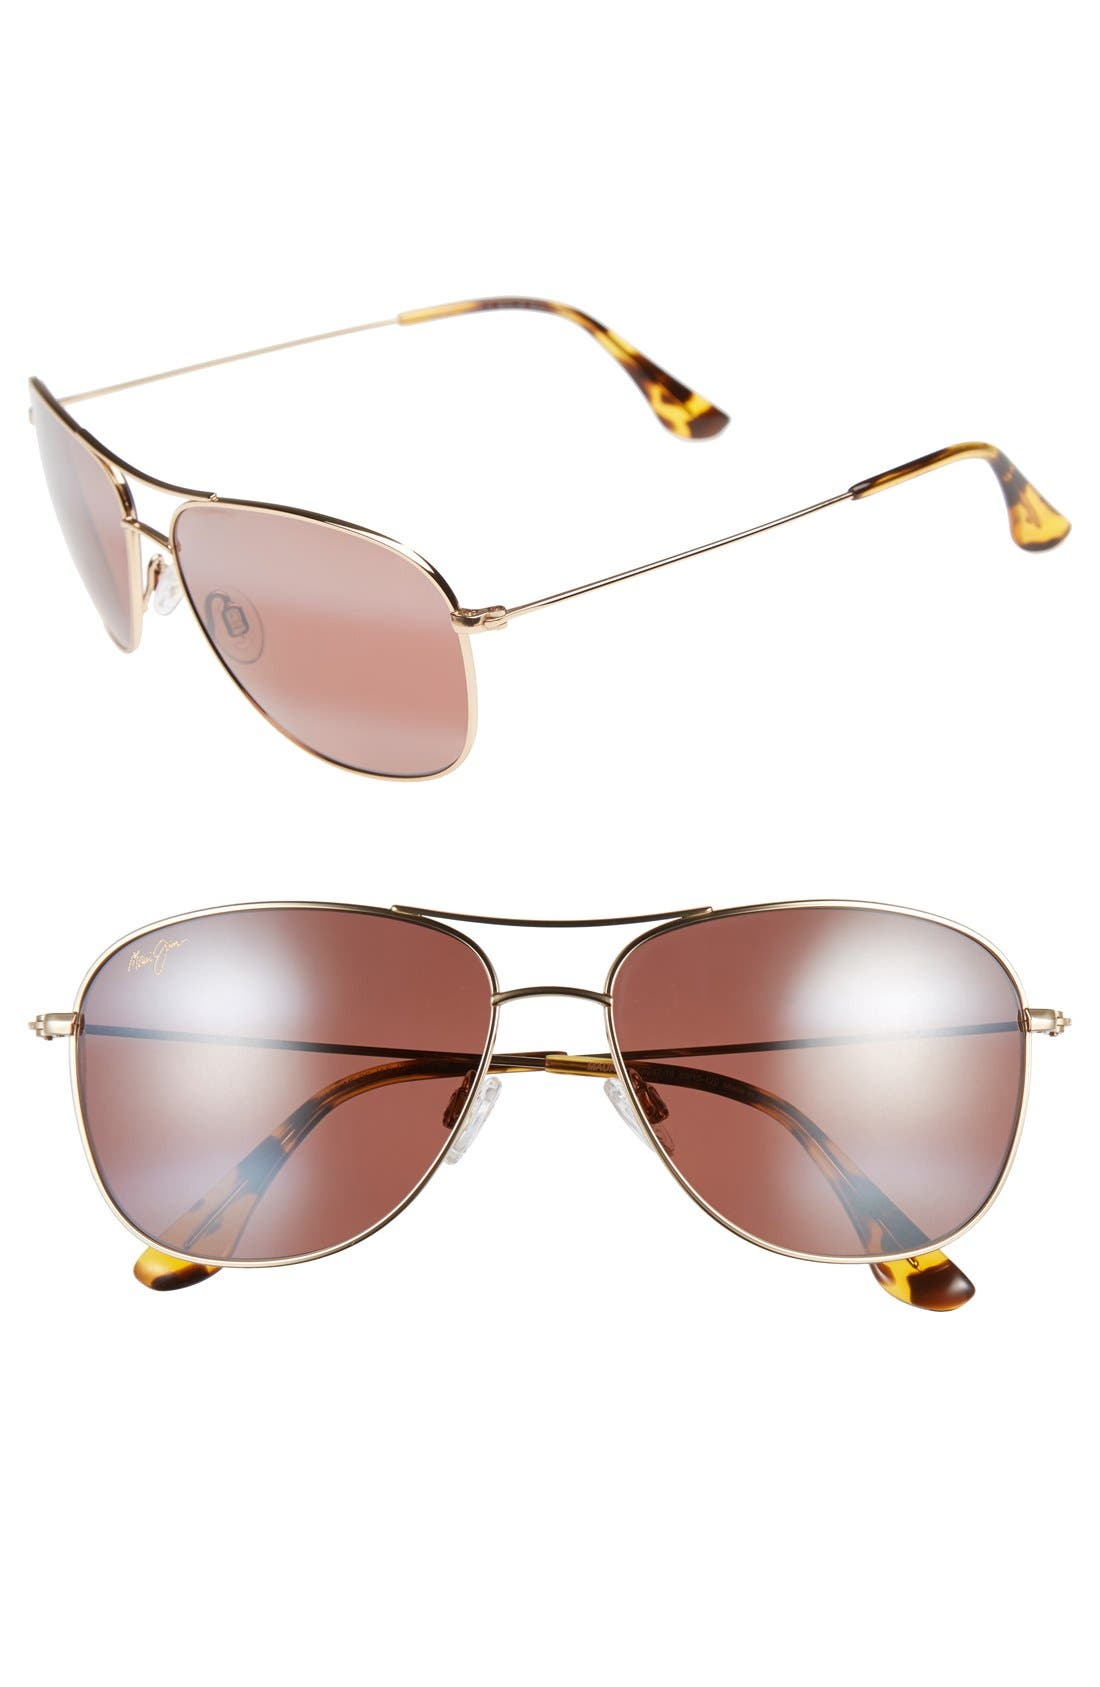 Cliff House 59mm Polarizedplus2 Metal Aviator Sunglasses